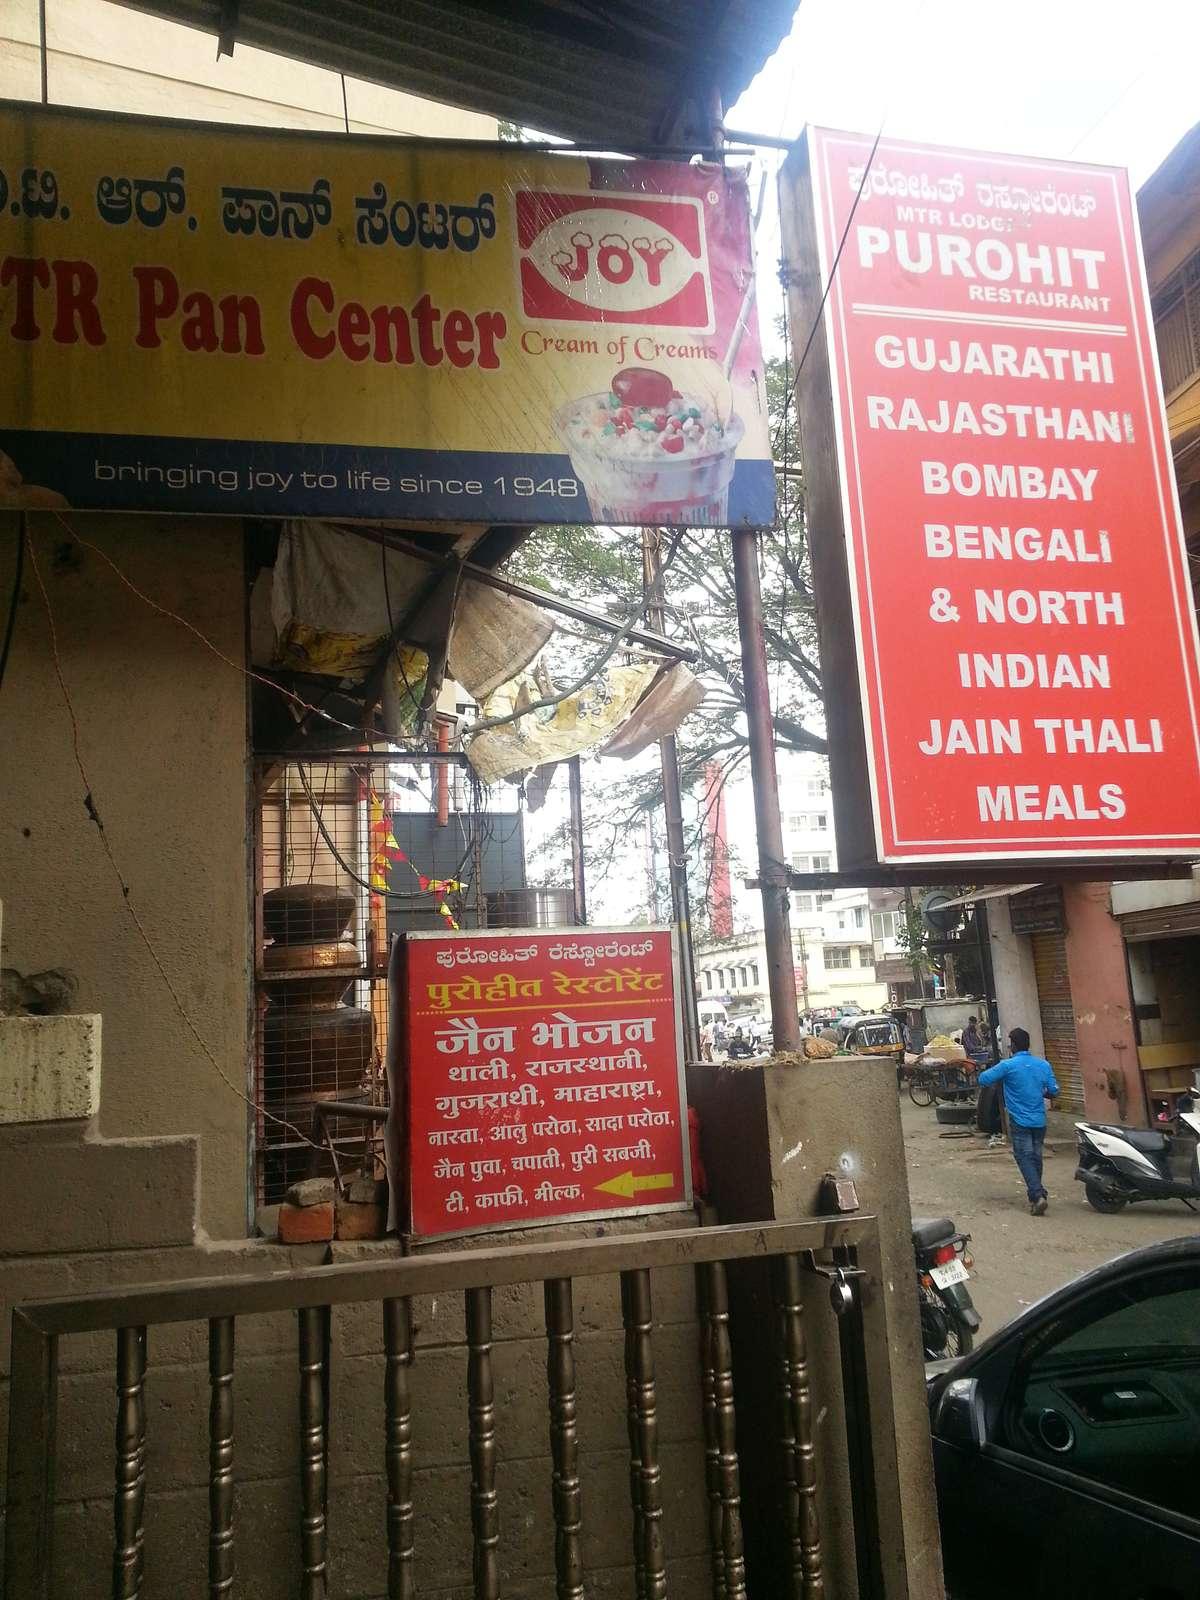 Purohit Restaurant - Mandi Mohalla - Mysore Image